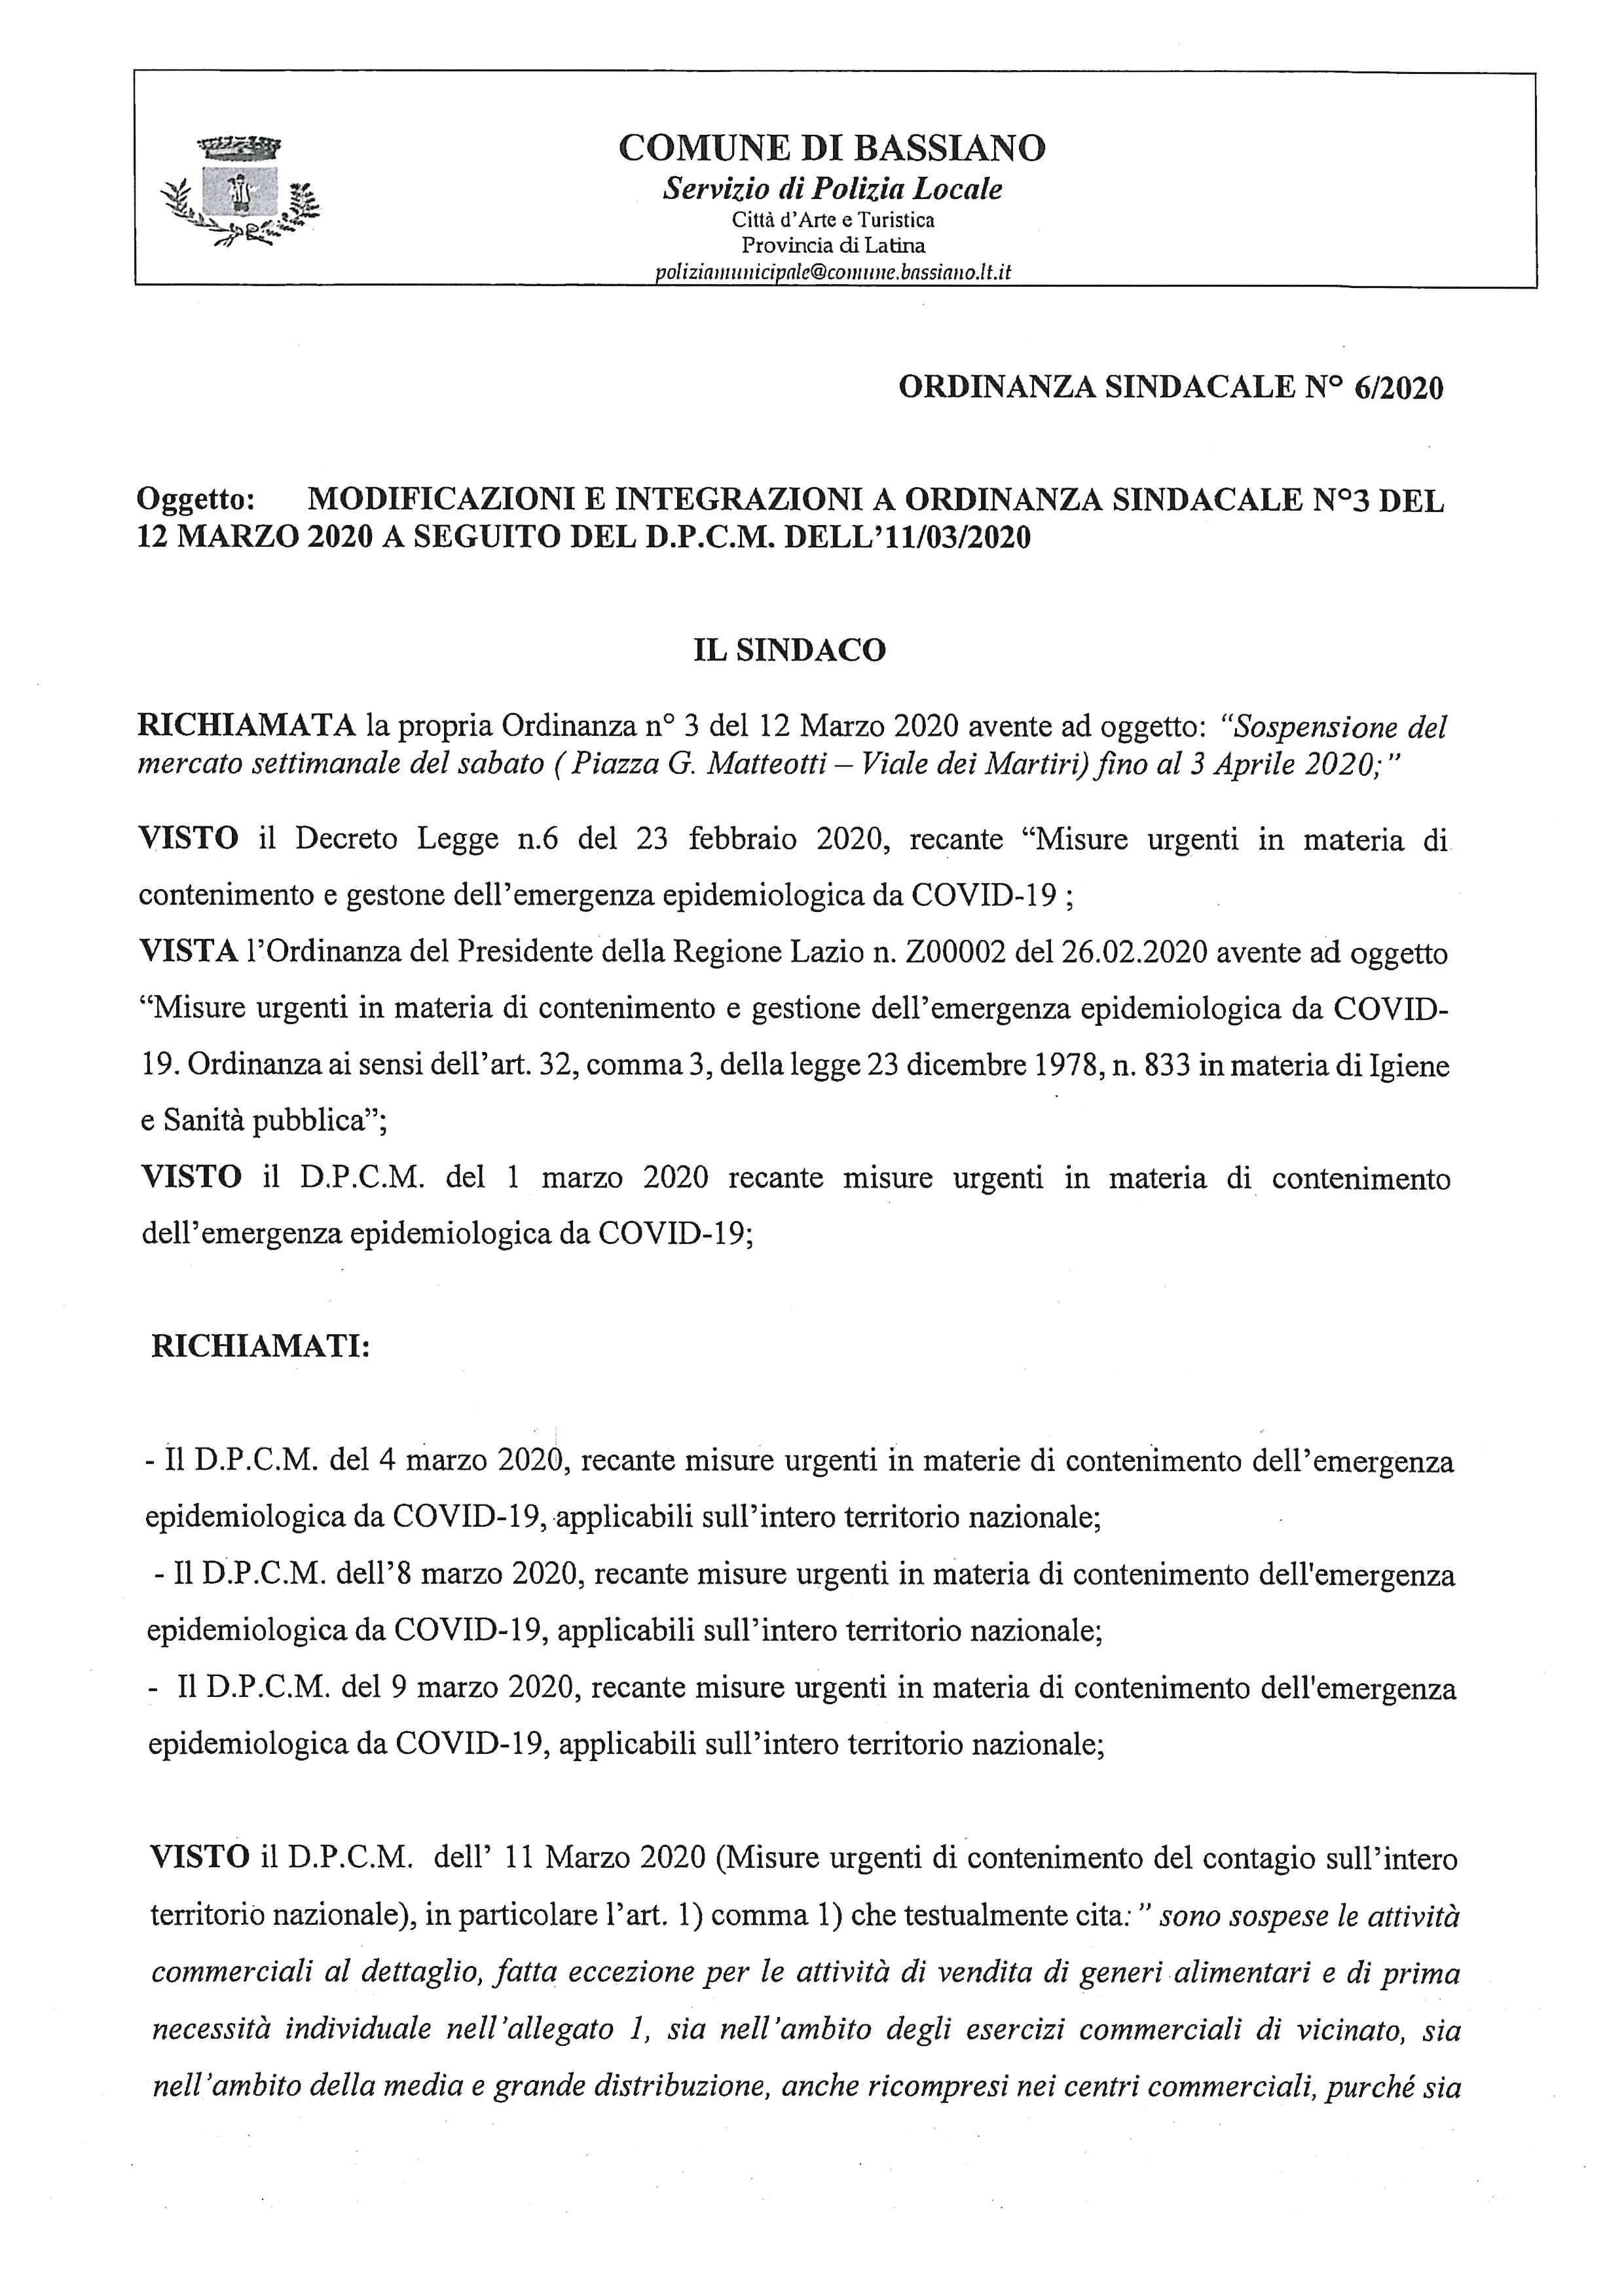 ORDINANZA SINDACALE N. 6/2020